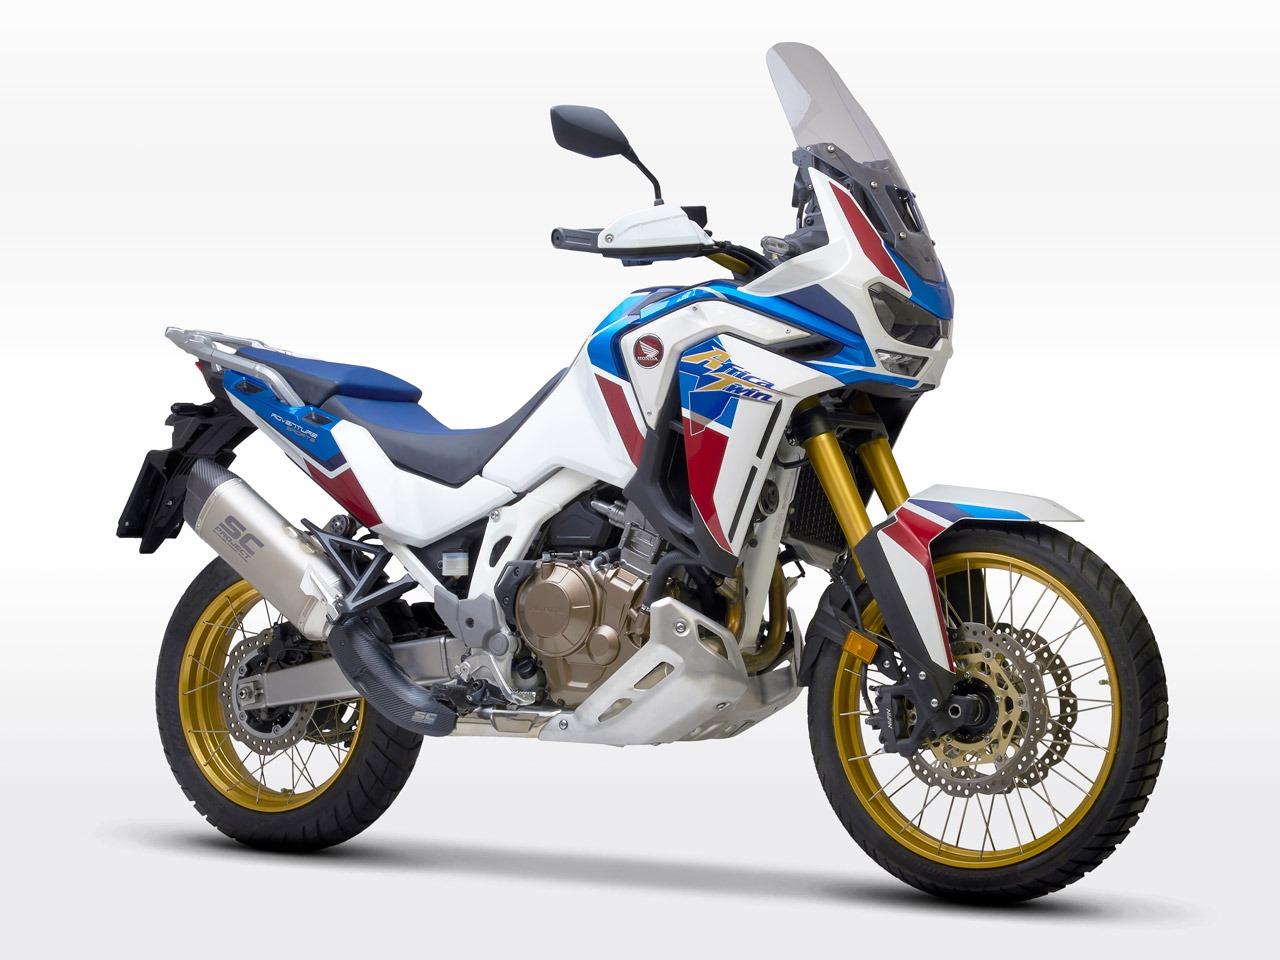 Honda_CRF1100L-AfricaTwin_my2021_Adventure-Titanio_3-4Anteriore_1280x960px_web-partnership